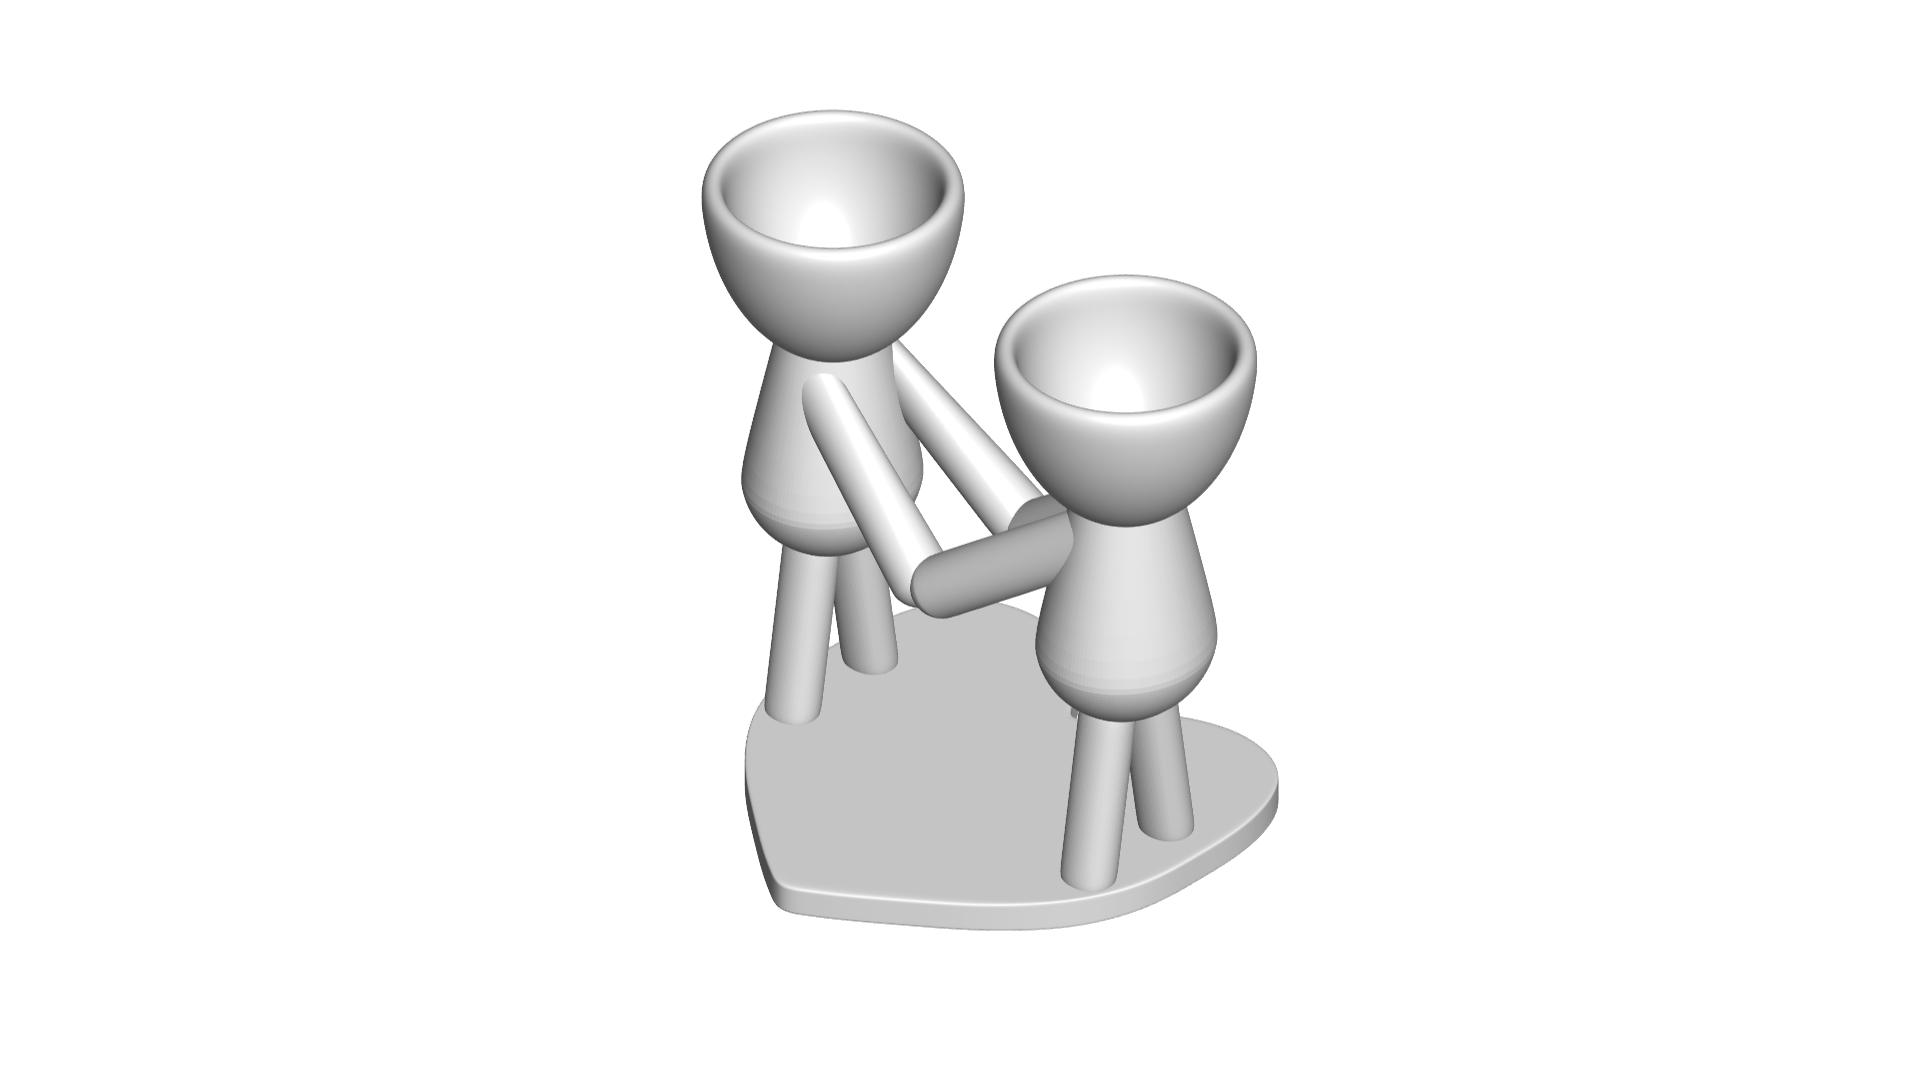 Enamorados_N4_Blanco_1.png Télécharger fichier STL gratuit N° 4 VASE POT DE FLEURS ROBERT IN LOVE • Plan à imprimer en 3D, CREATIONSISHI